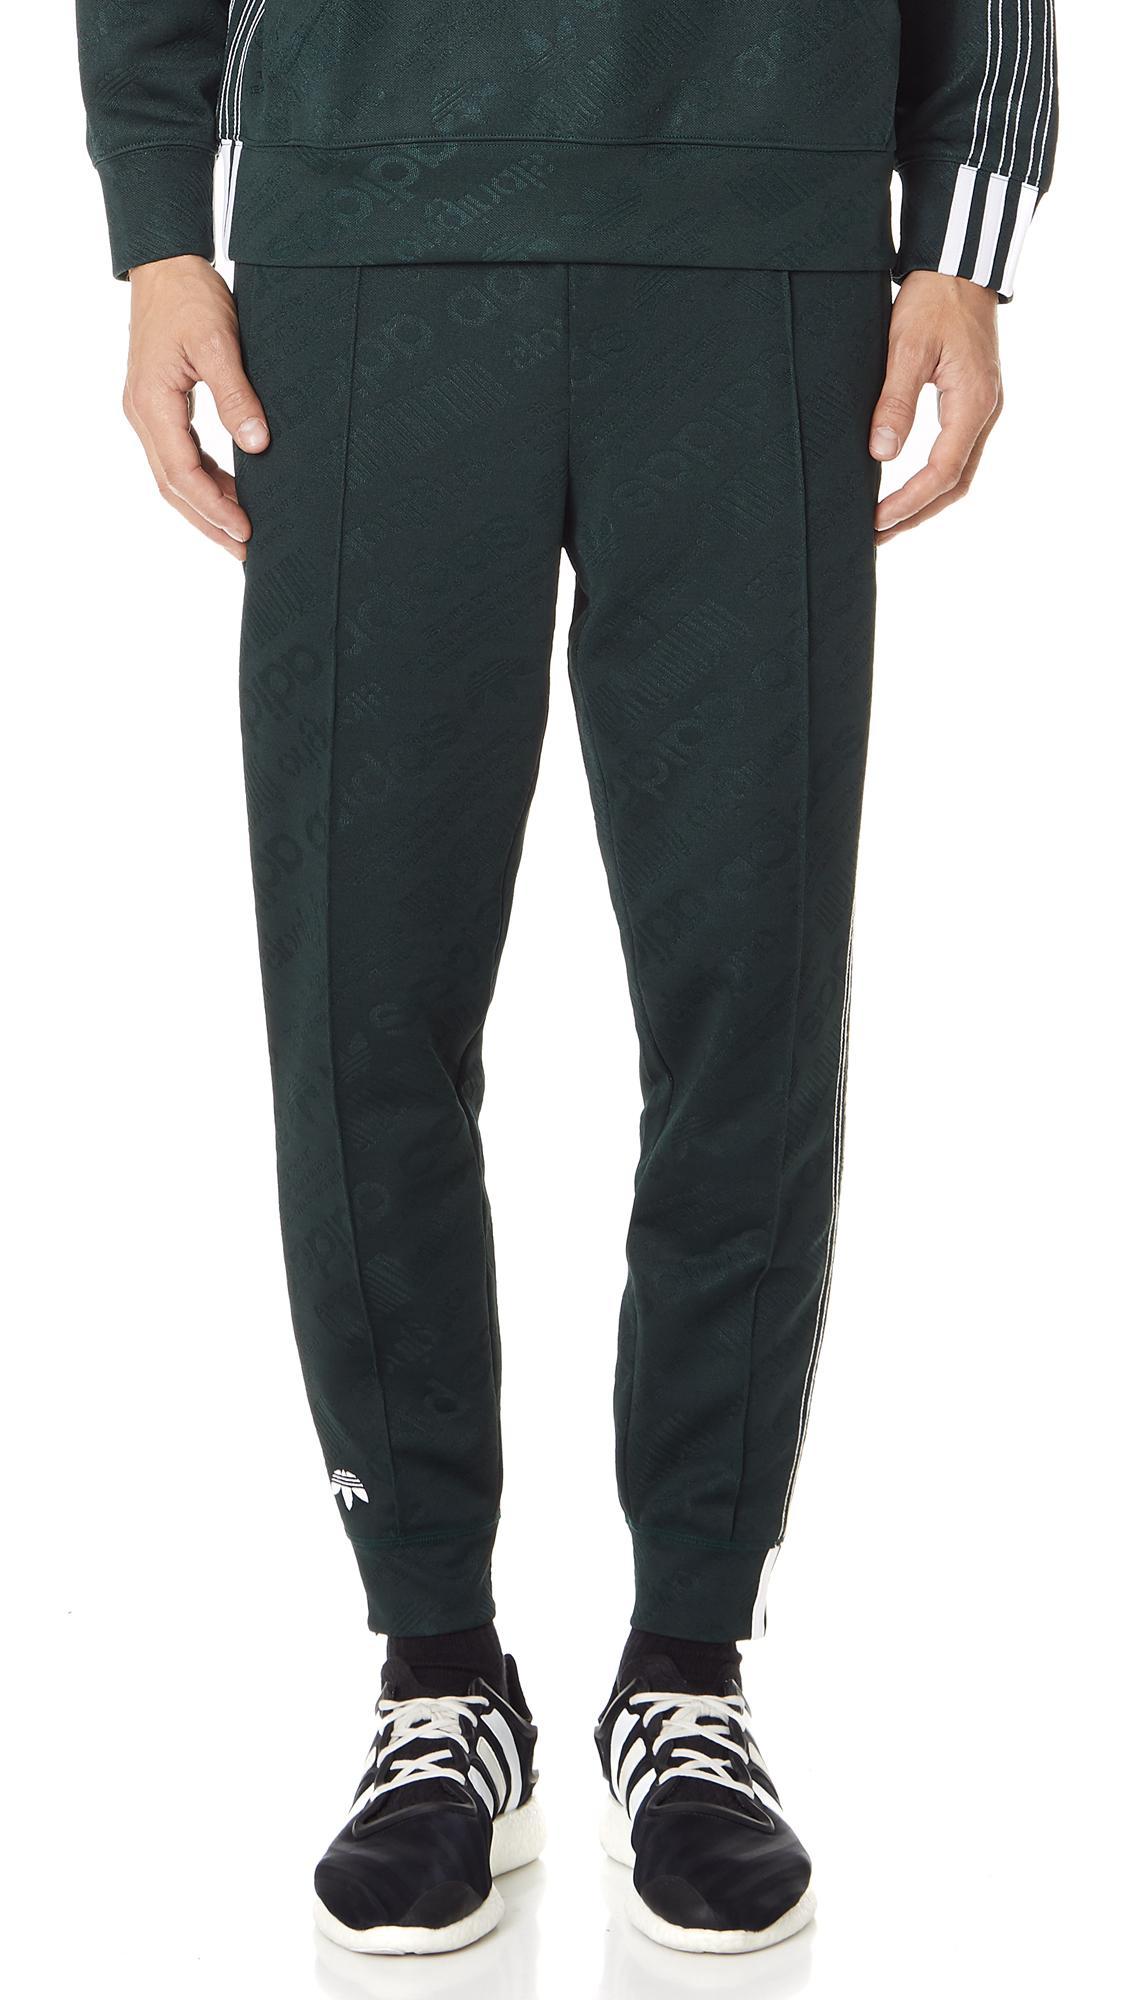 Adidas Originals By Alexander Wang Aw Jacquard Track Pants In Green